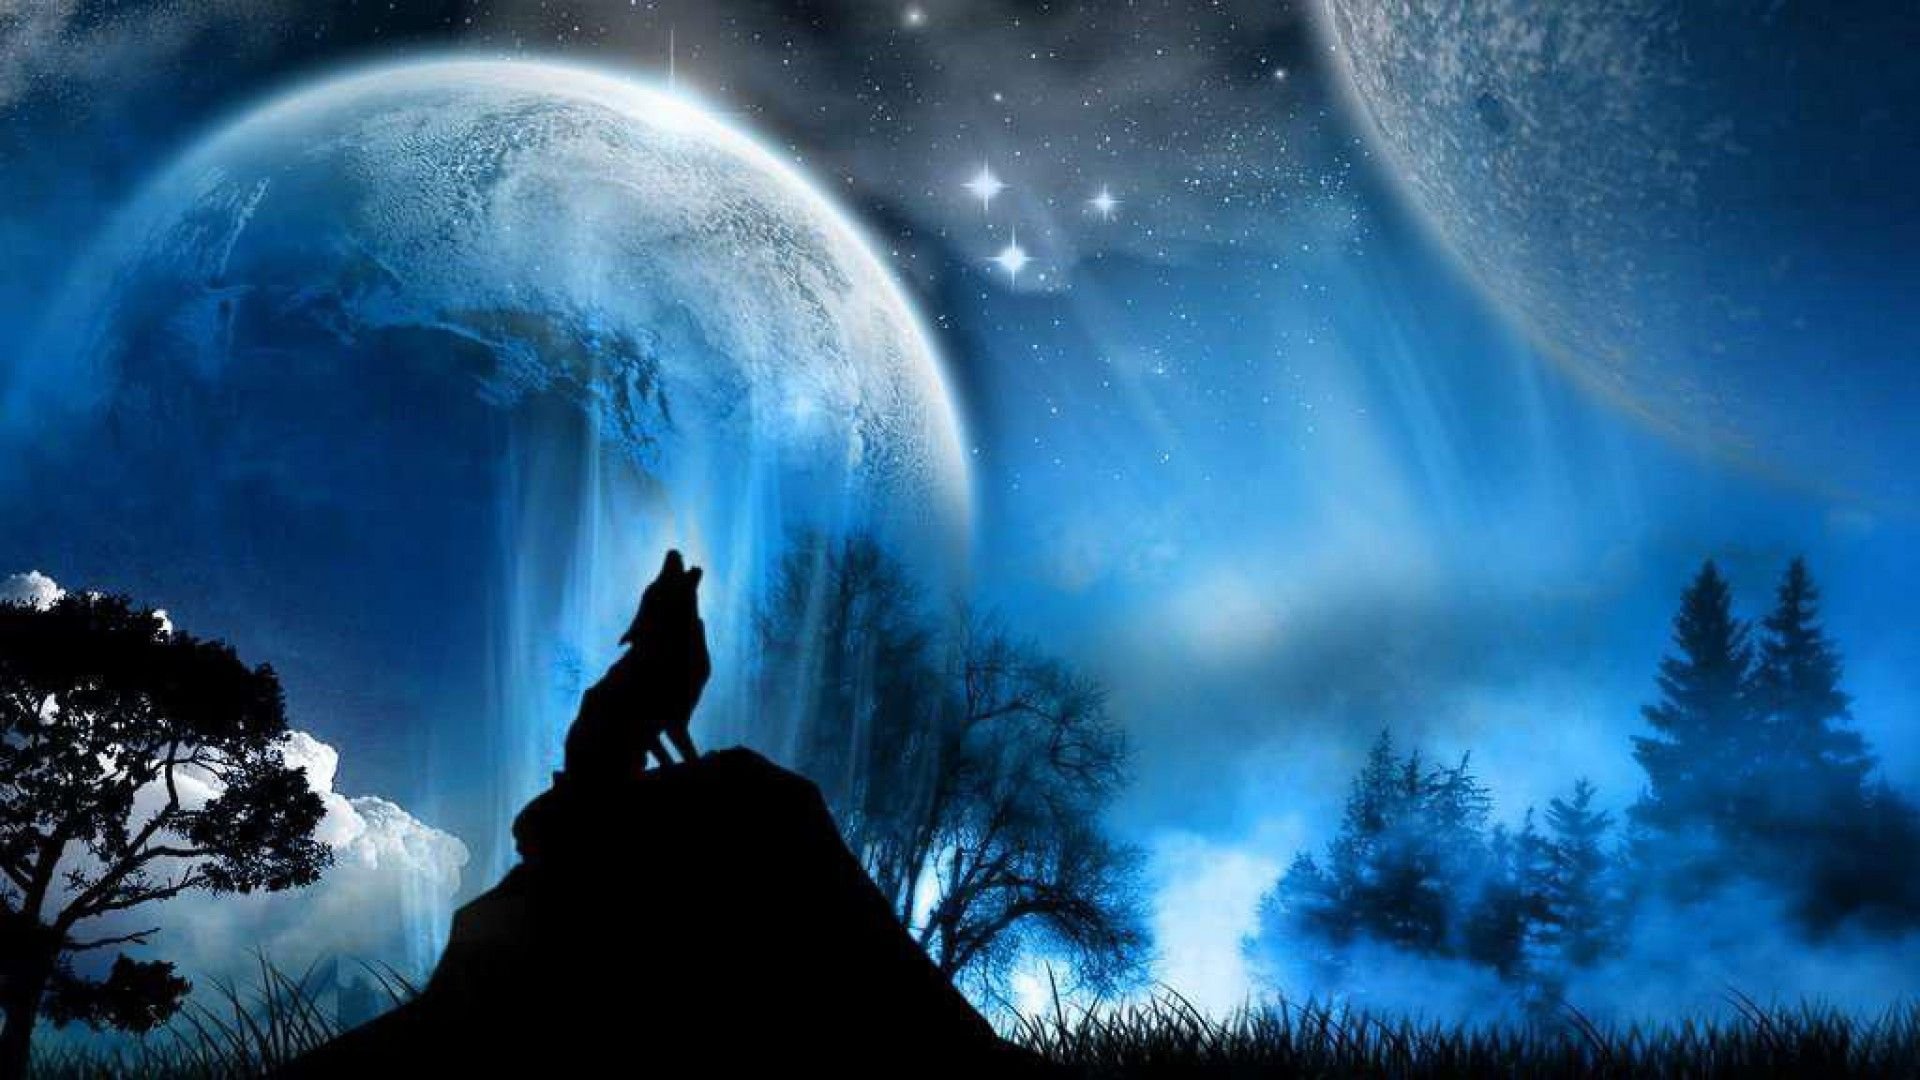 Wolf Wallpapers Download IH3C9BA   4USkY 1920x1080